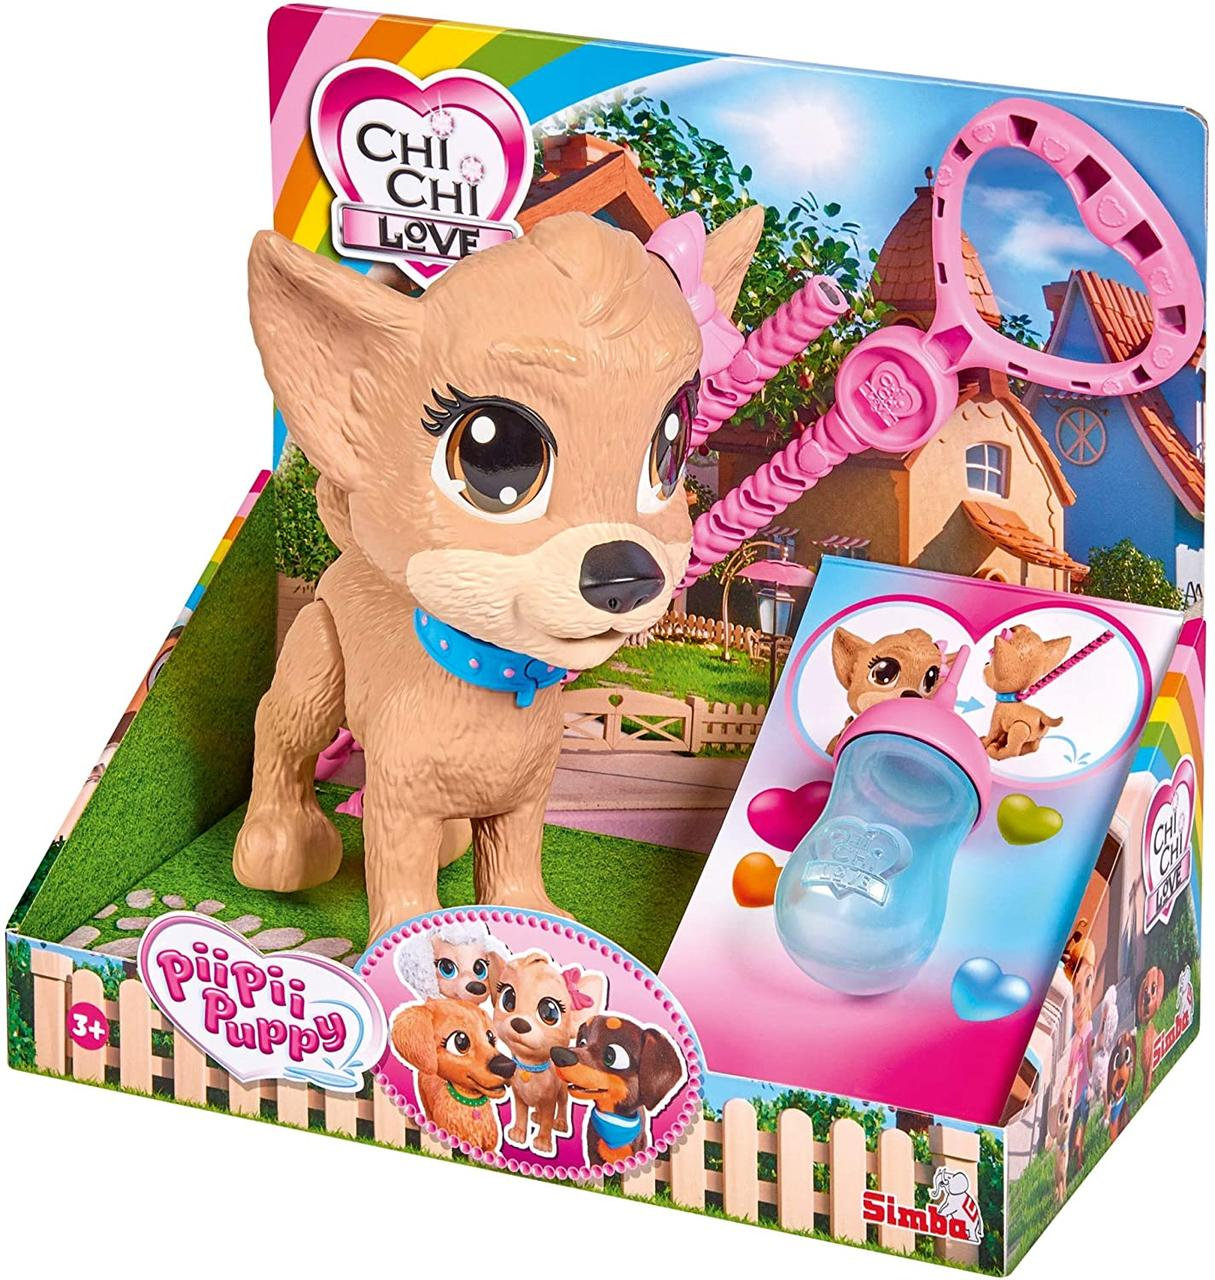 Интерактивная собачка Чи Чи Лав Пи Пи Паппи Chi Chi Love 5893460